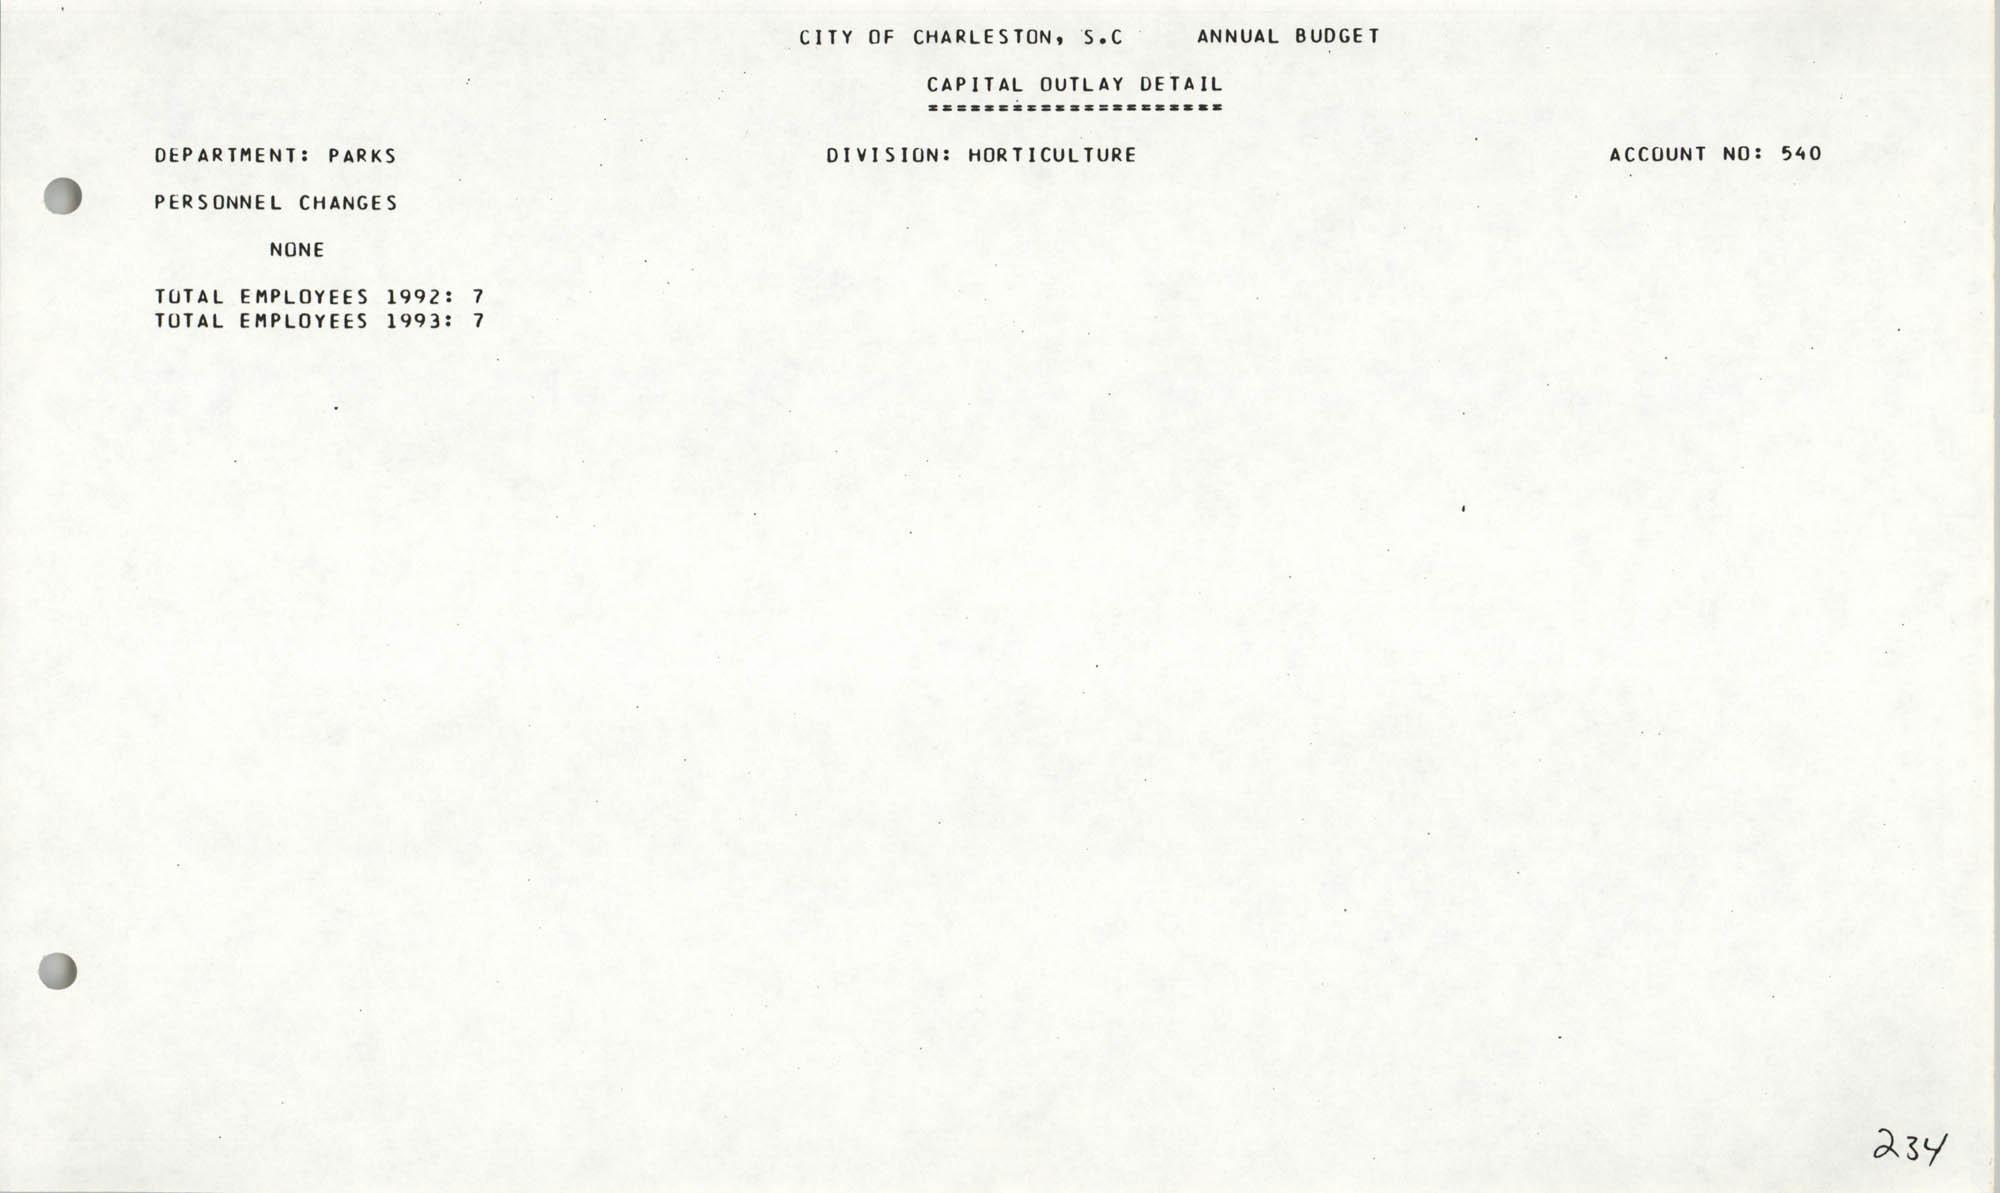 The City Council of Charleston, South Carolina, 1993 Budget, Page 234